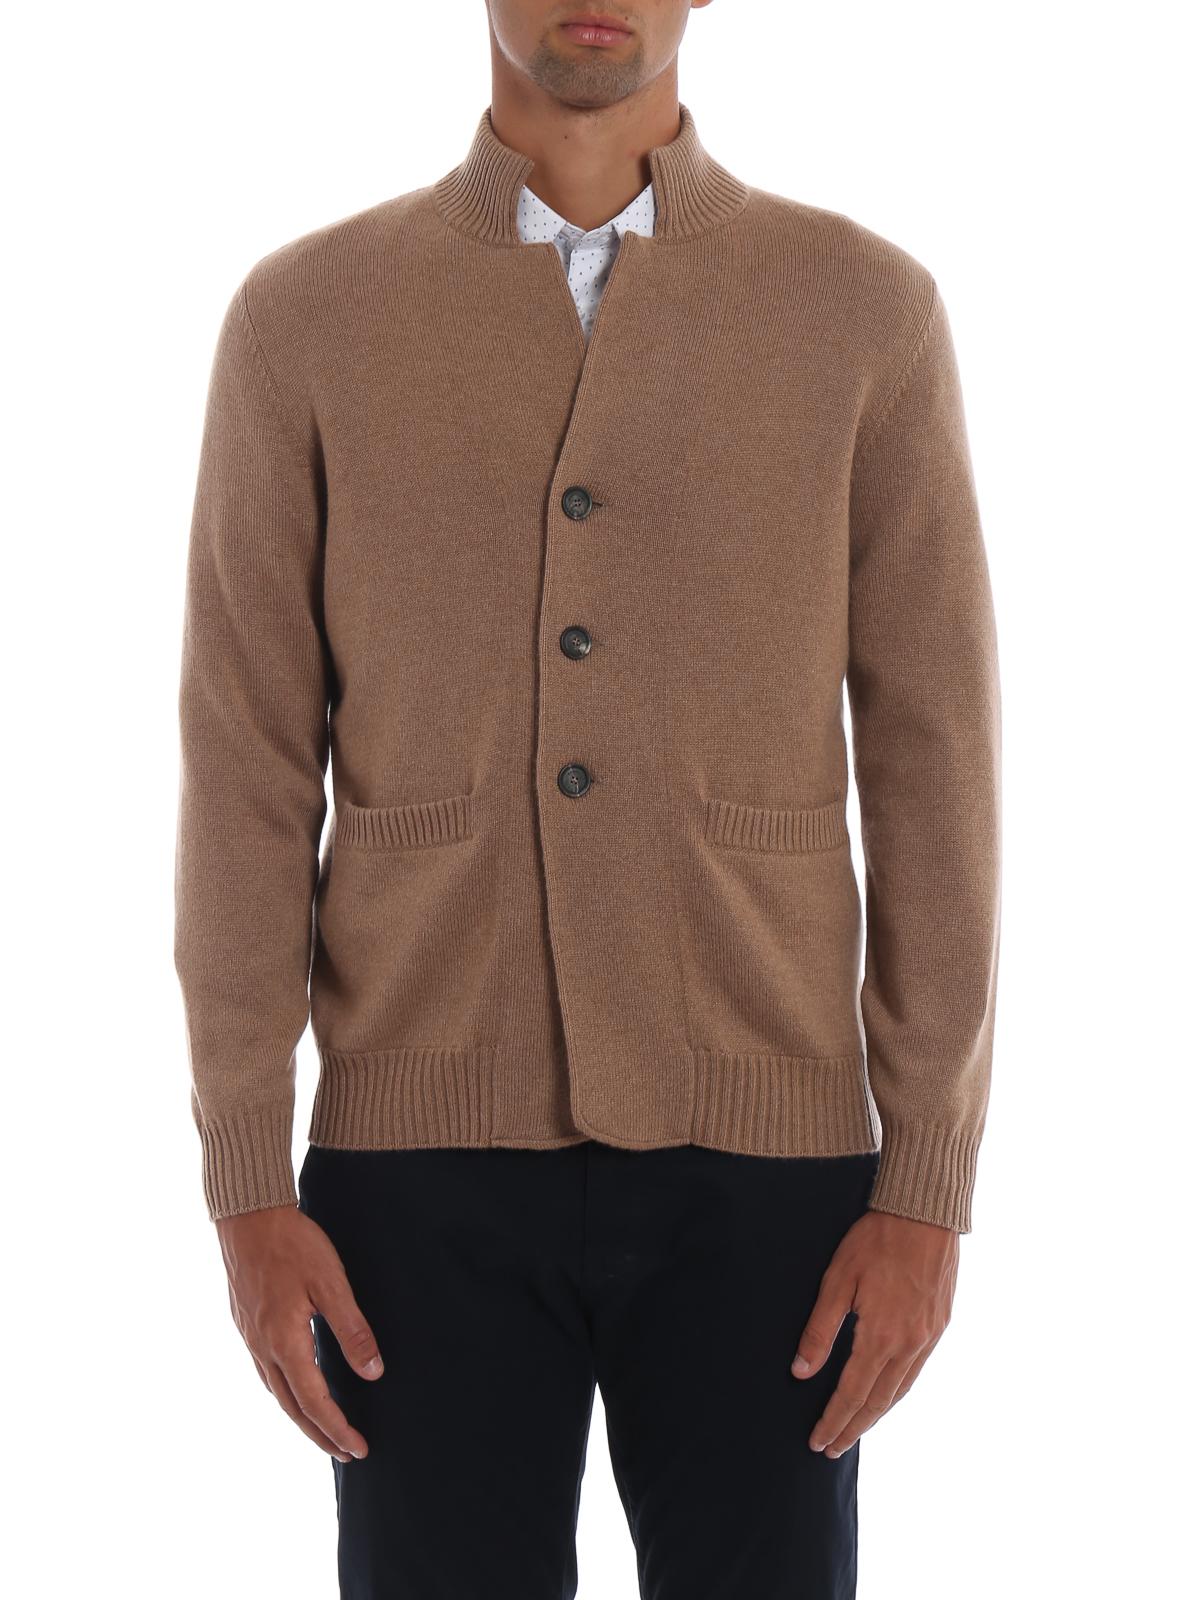 newest 9d5da f9634 Brunello Cucinelli - Cardigan in cashmere color cammello ...